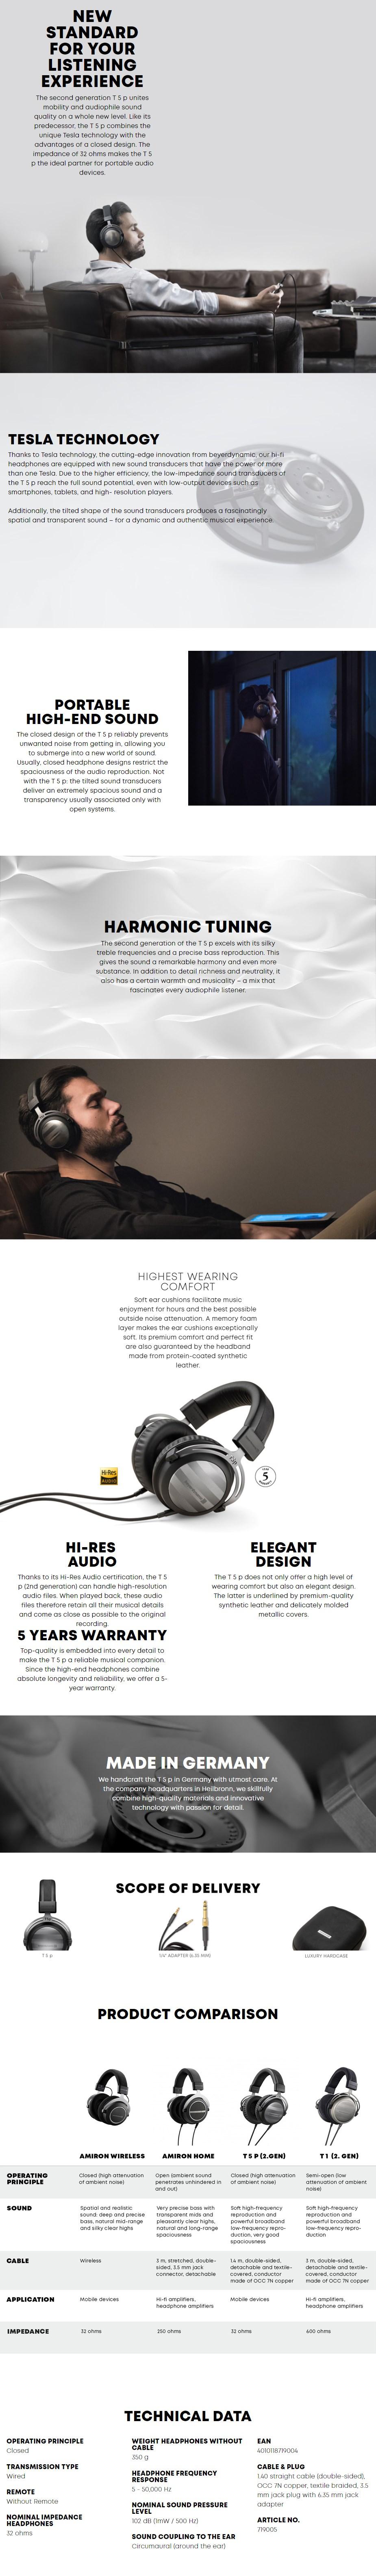 Beyerdynamic T 5 P Audiophile Closed-Back Hi-Fi Headphones - 2nd Generation - Overview 1